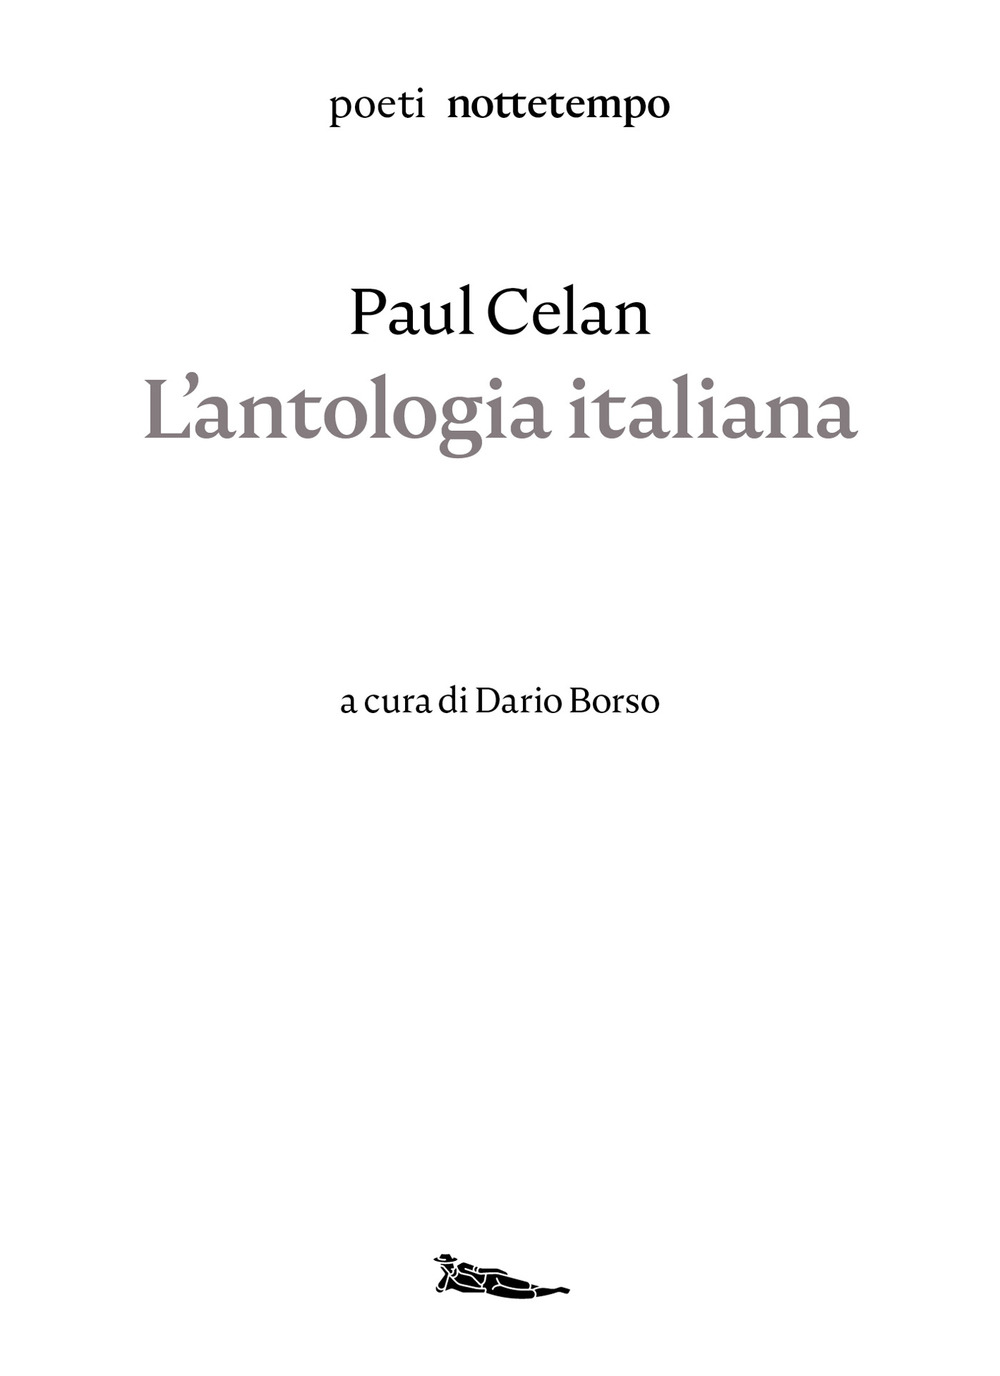 L'antologia italiana